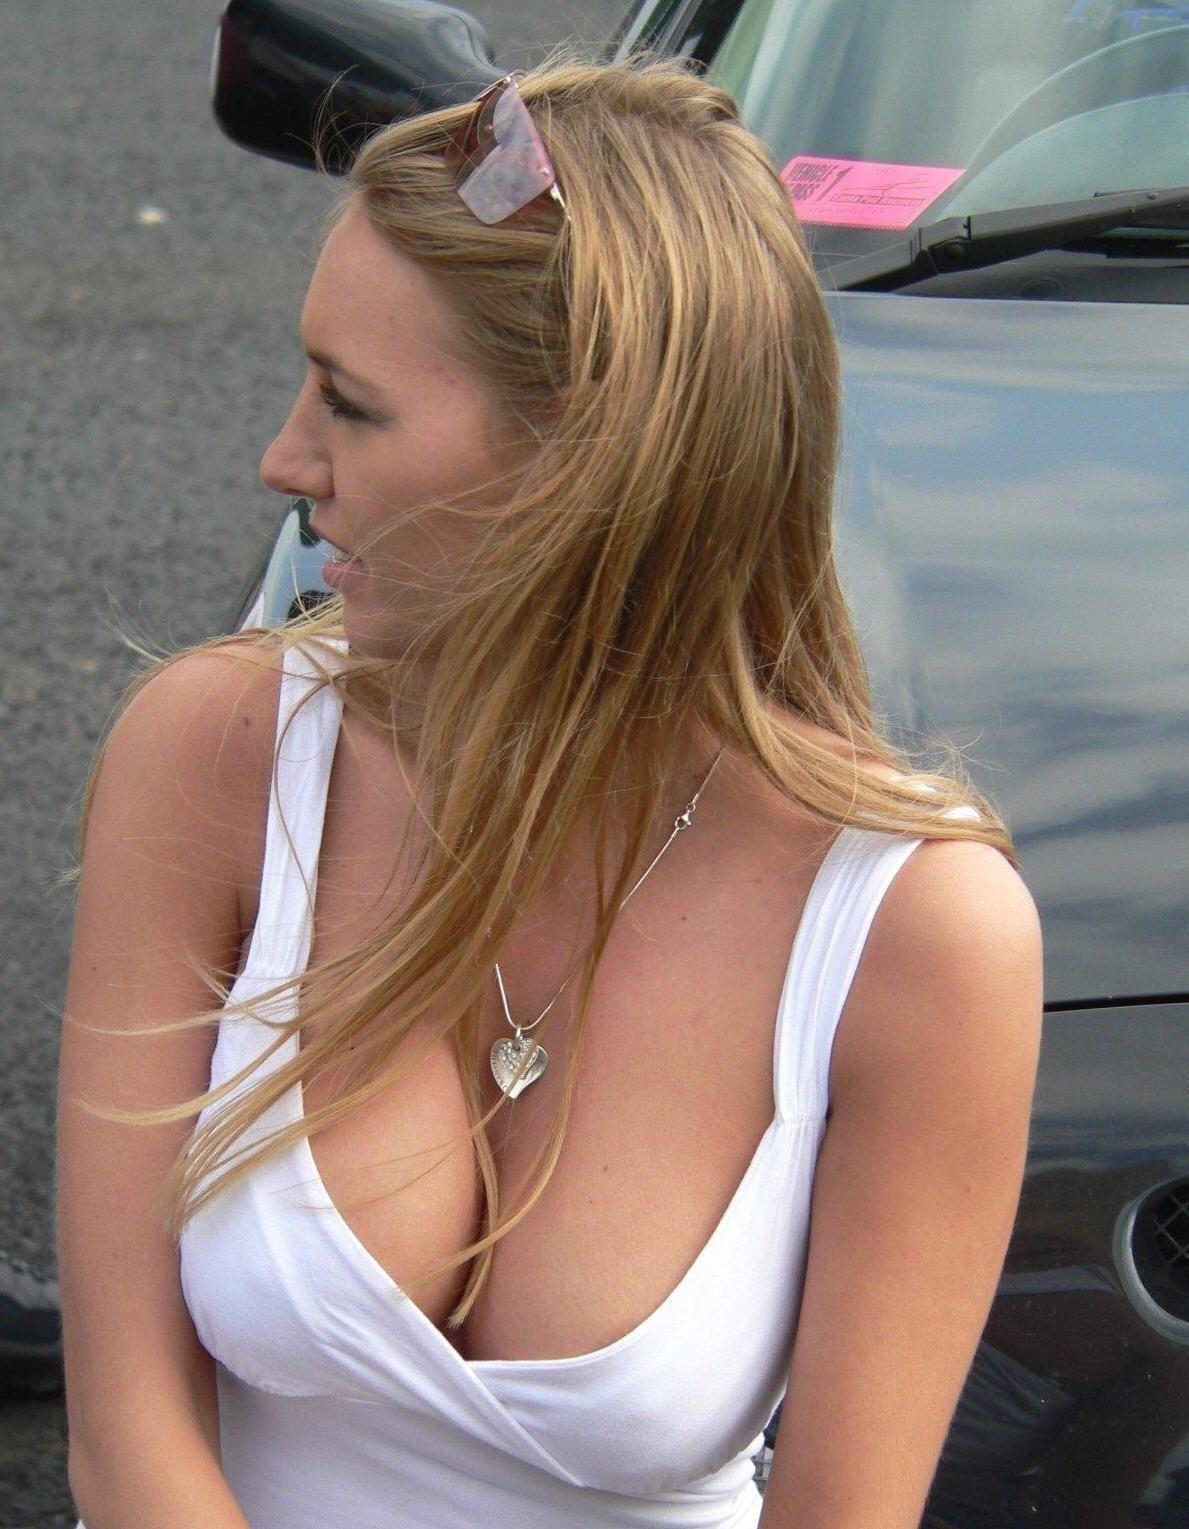 Nude pics of diane lane